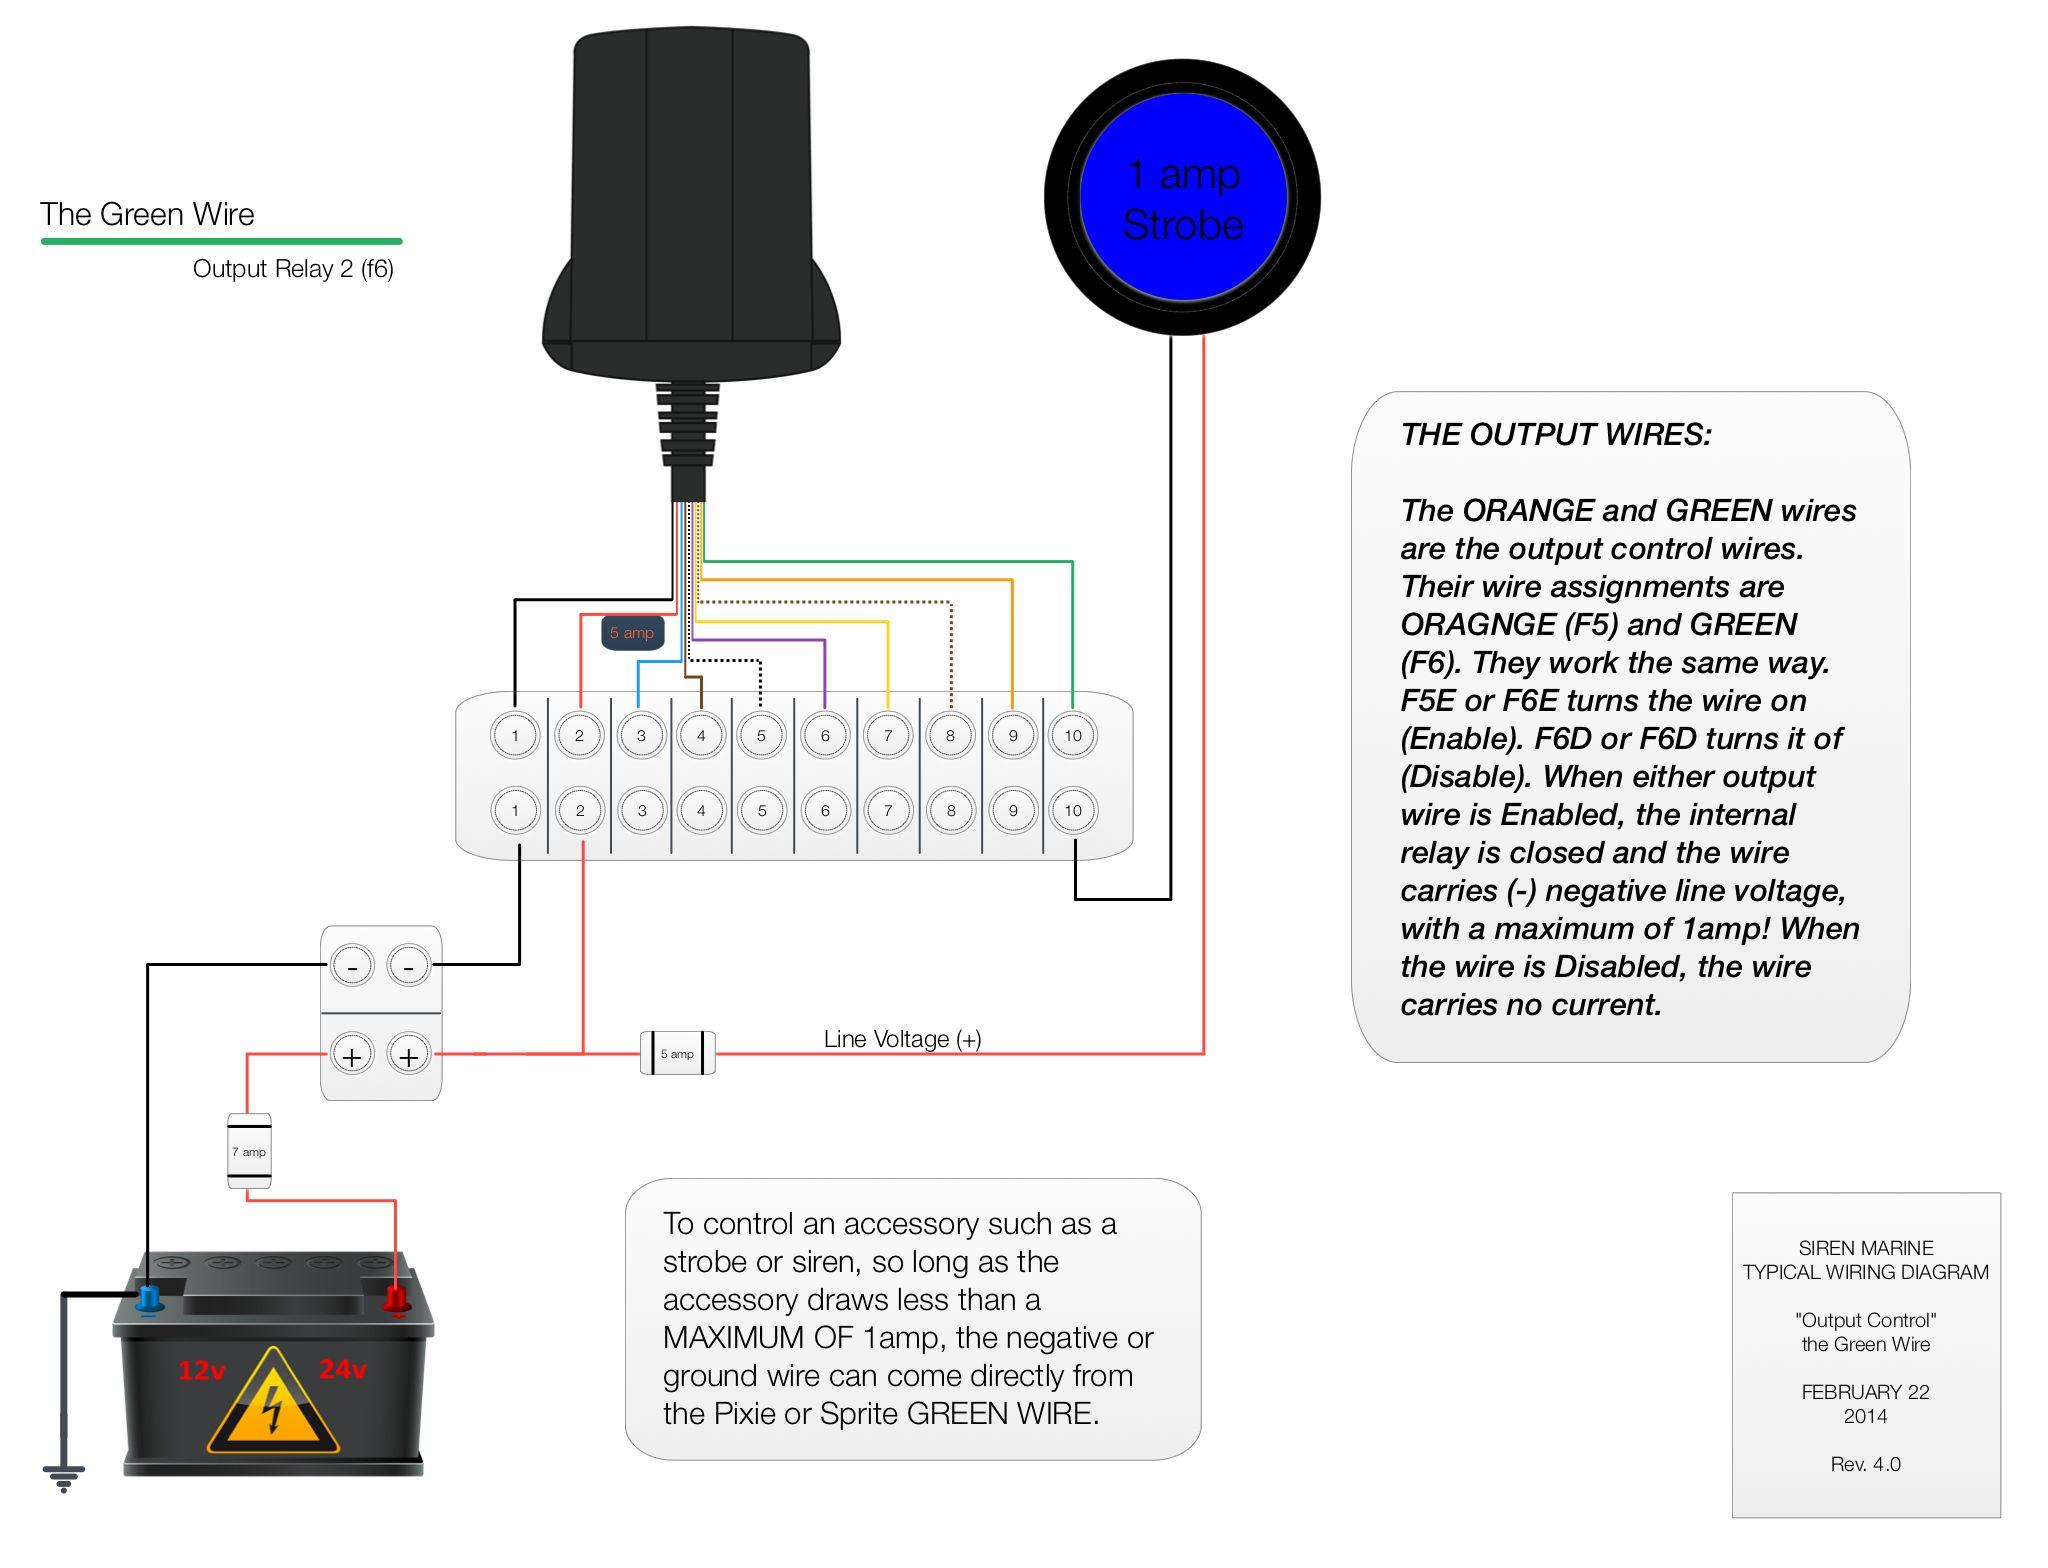 galls siren wiring diagram wiring diagramgalls remote siren wiring diagram  free download wiring diagram